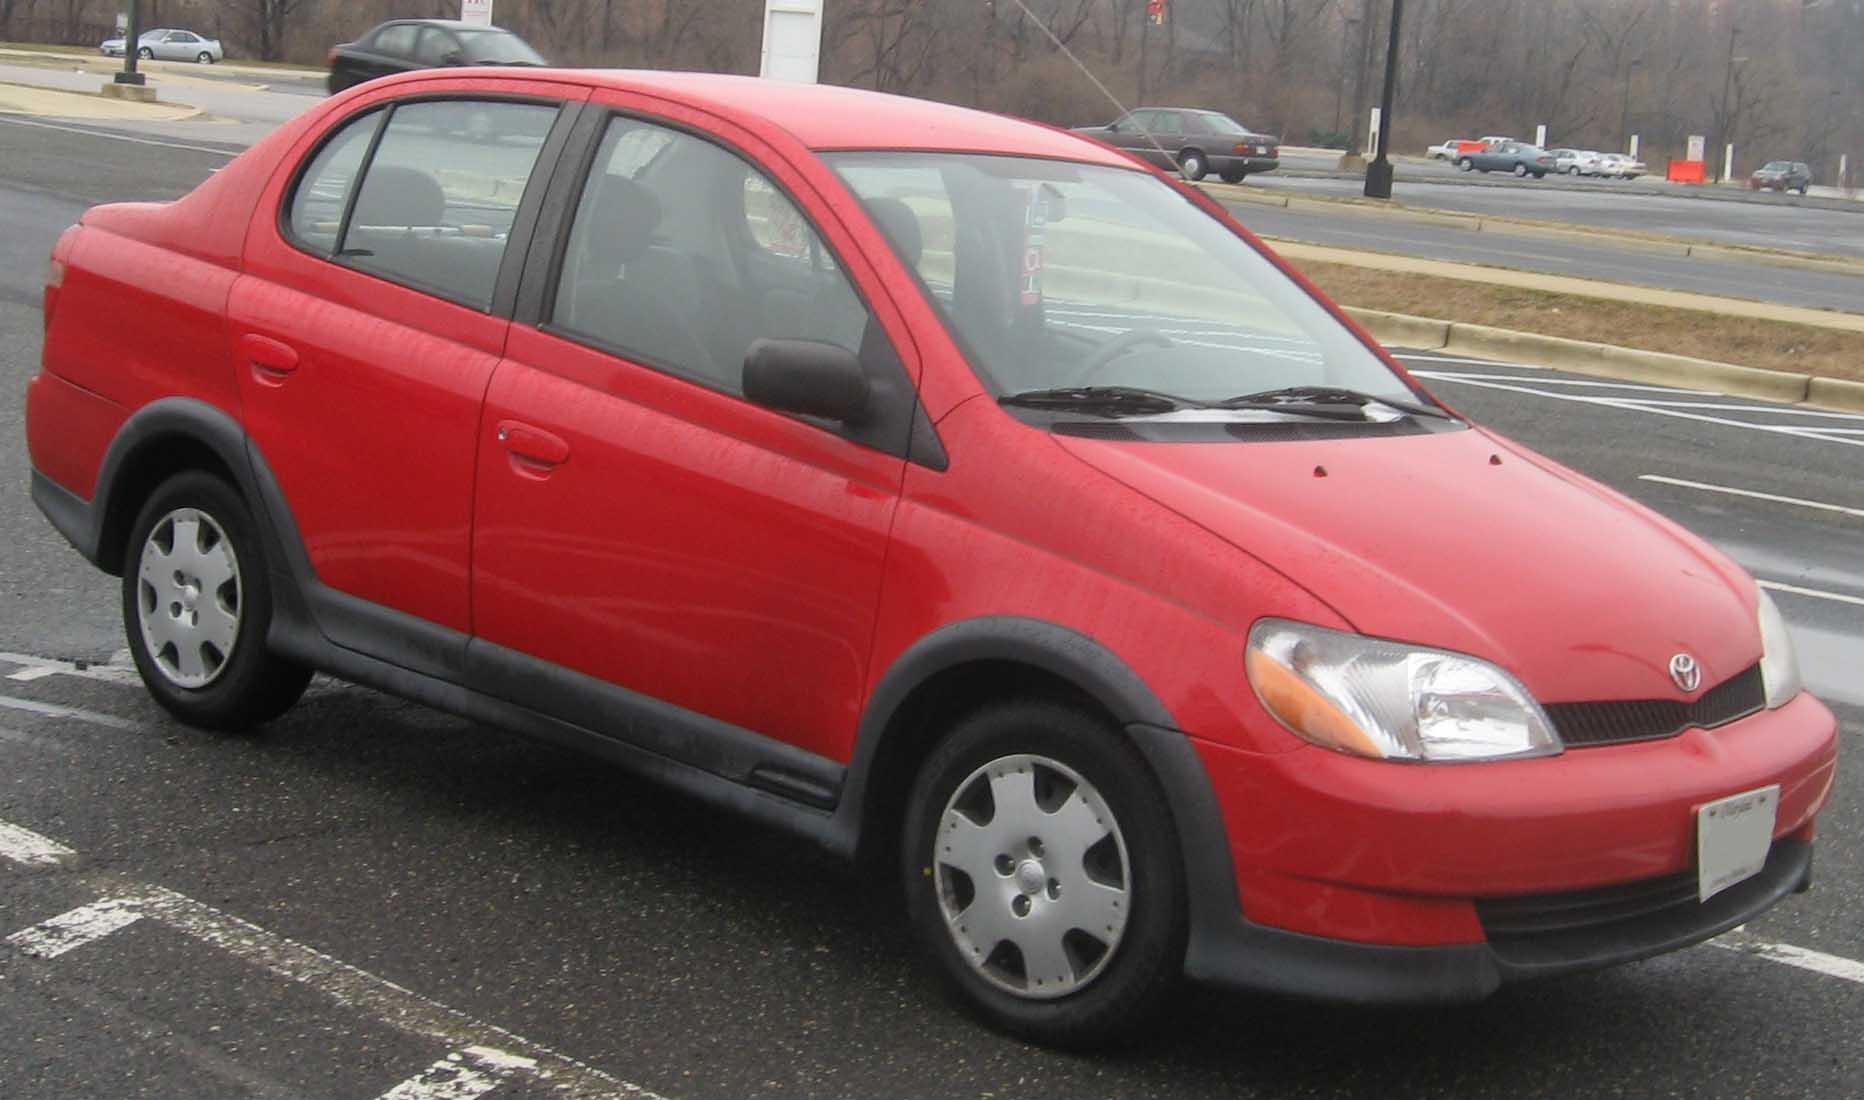 File:00-02 Toyota Echo sedan.jpg - Wikimedia Commons